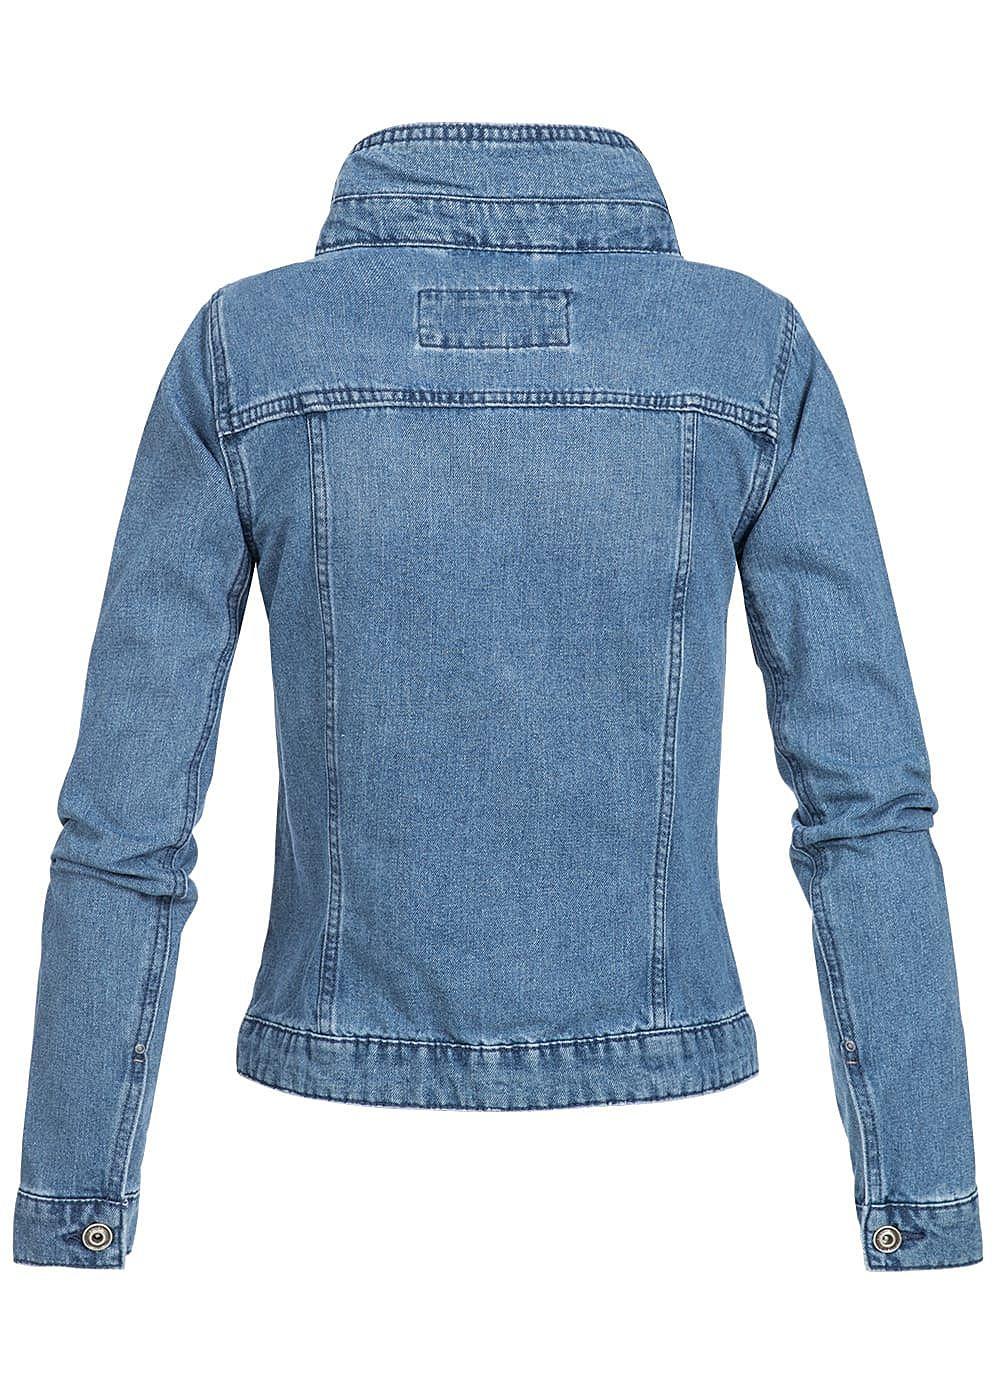 only damen jeans jacke 2 brusttaschen medium blue denim 77onlineshop. Black Bedroom Furniture Sets. Home Design Ideas